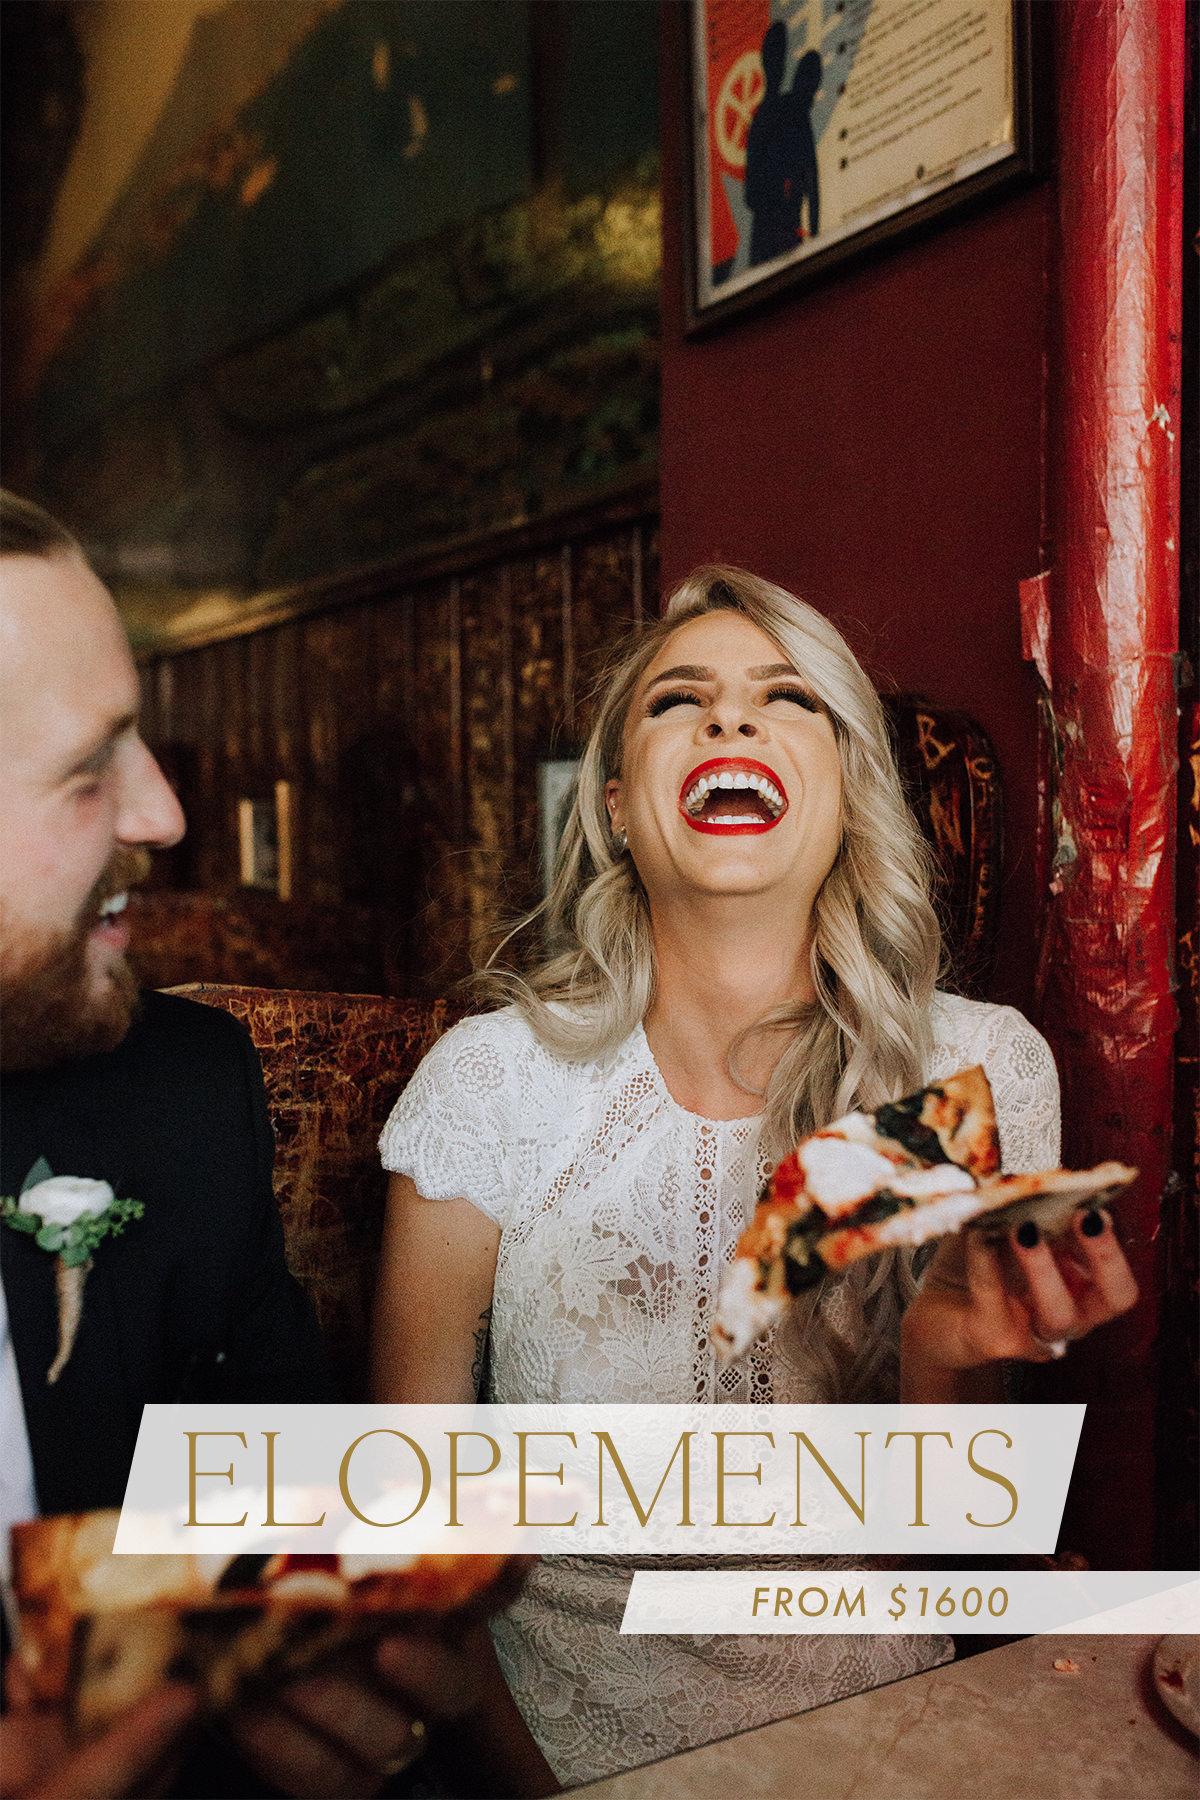 New York Wedding Photographer, Brooklyn Wedding Photography, Upstate Wedding Photography, NYC Elopement Photos, Central Park Elopement, North Fork Wedding Photographer, Montauk Wedding Photographer